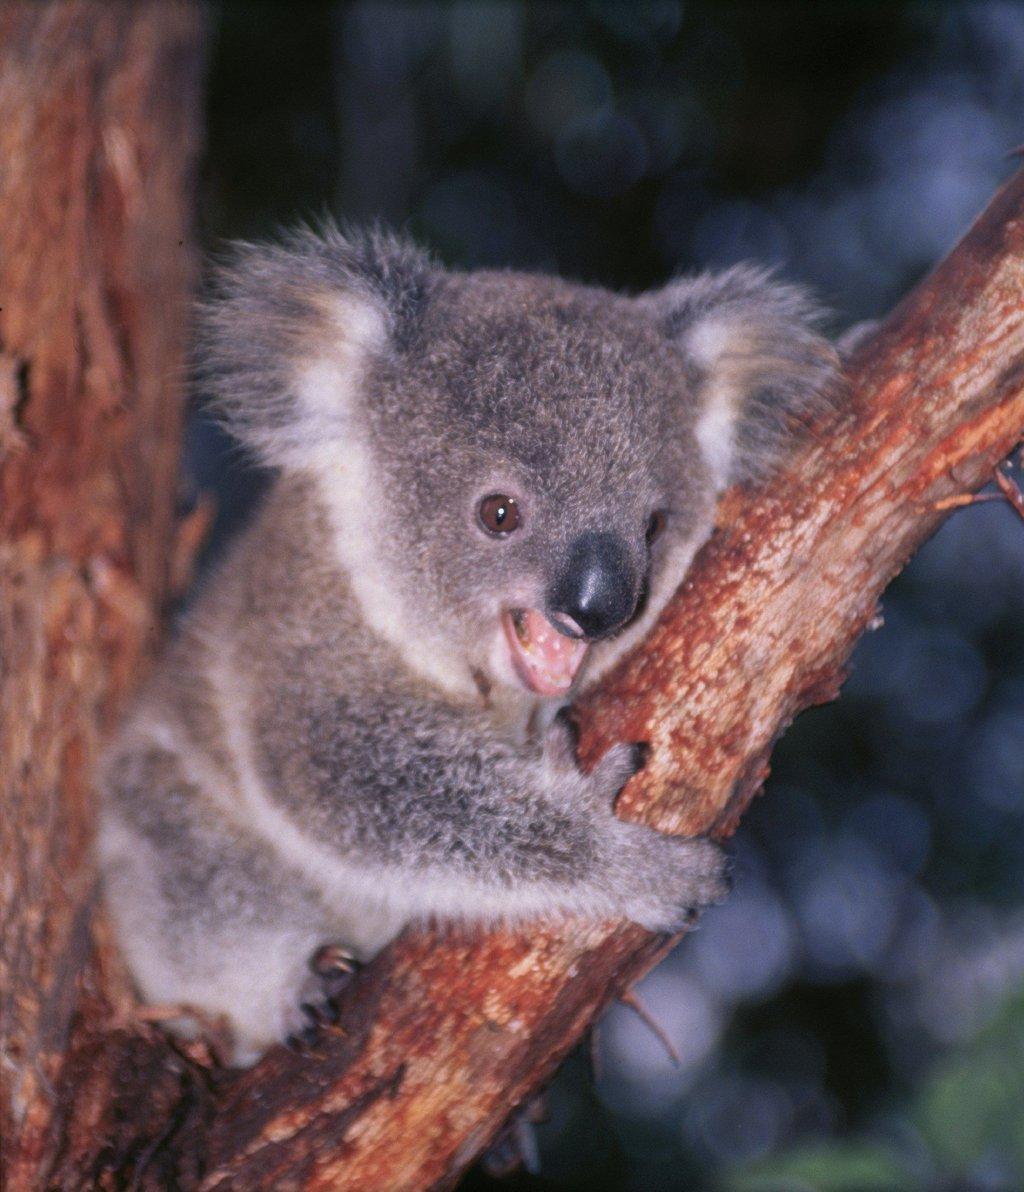 Cute baby koala - Pics of baby koalas ...